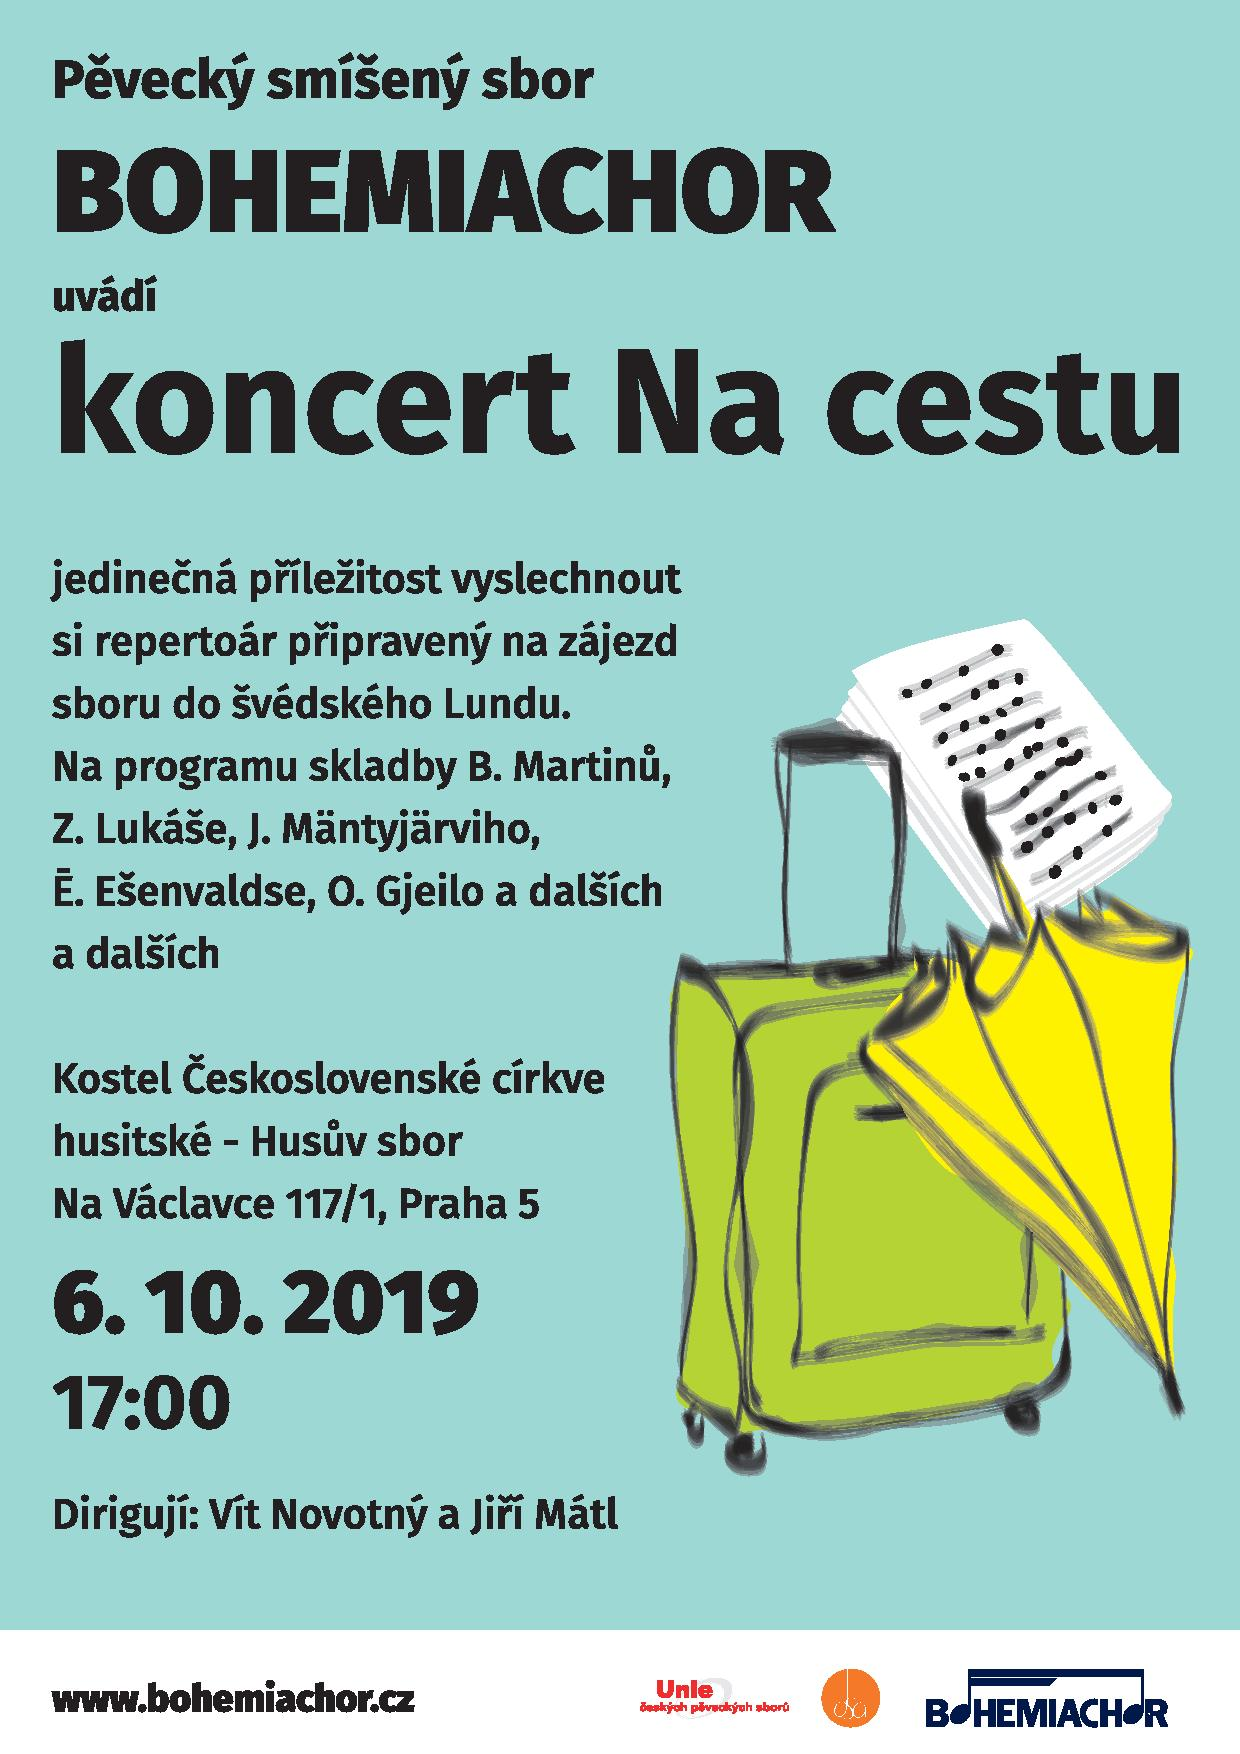 6.10.2019 od 17:00 v kostele Na Václavce 117/1 koncert smíšeného pěveckého sboru Bohemiachor s repertoárem pro zájezd do švédského Lundu